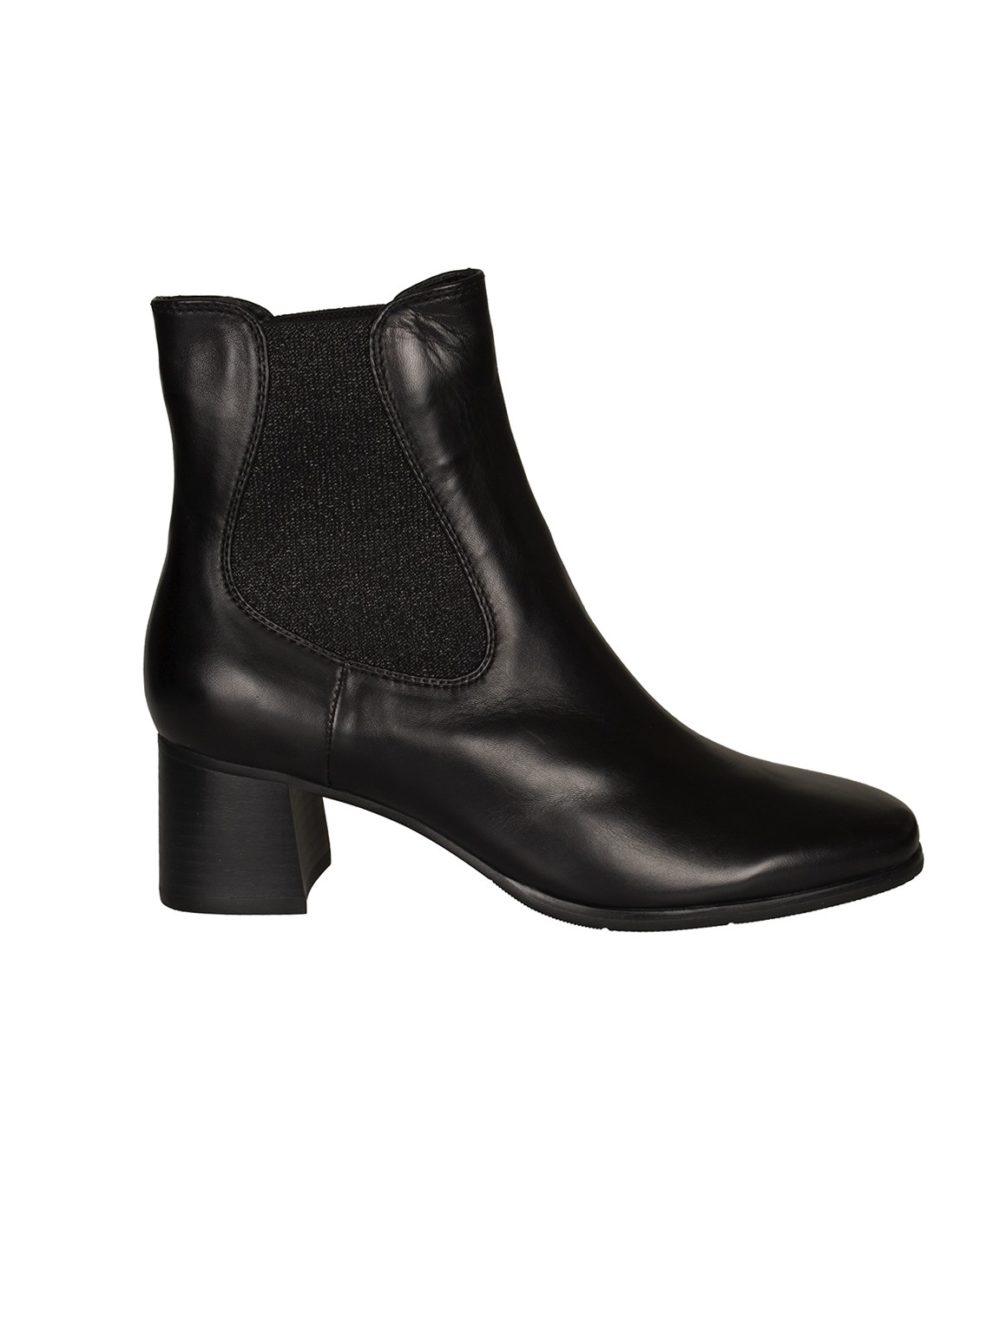 Ines 07 Boot Regarde le Ciel Katie Kerr Women's Clothing Women's Boots